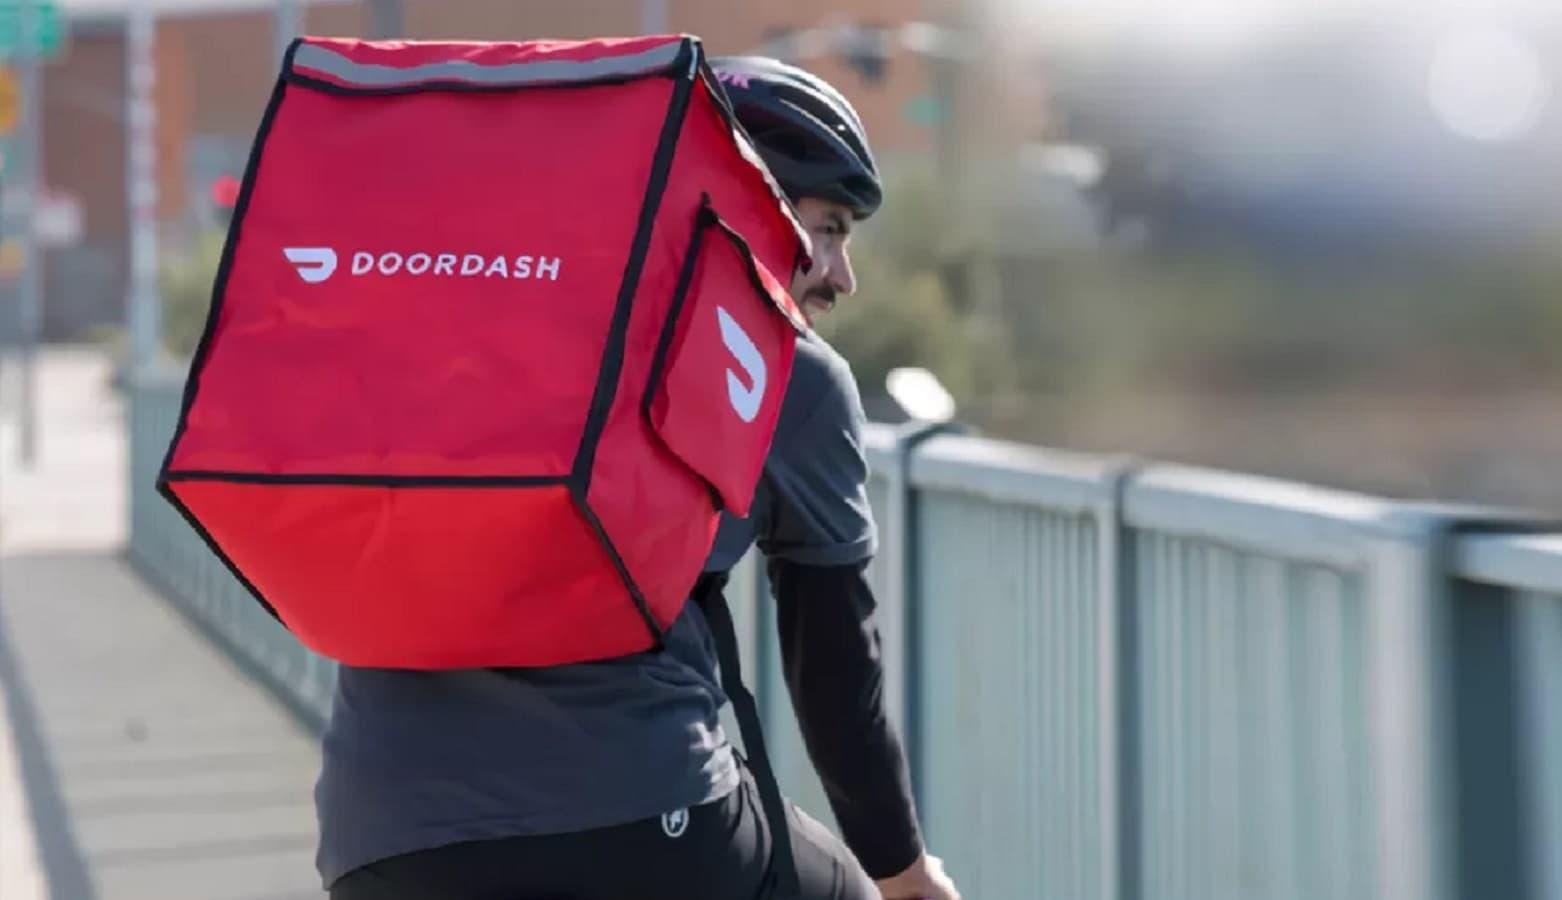 doordash delivery driver